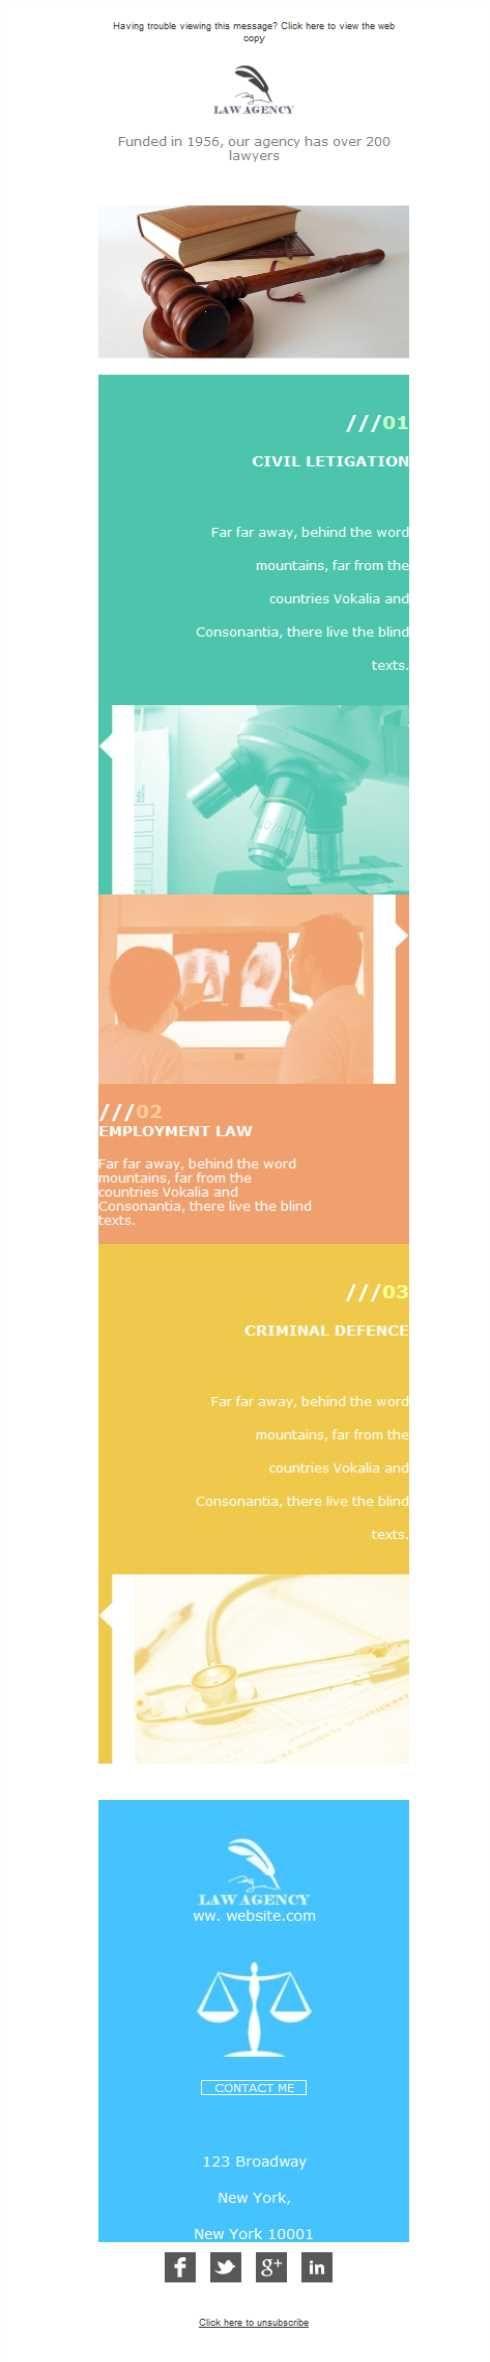 Versión responsive de plantilla newsletter para bufetes de abogados o servicios legales de consultoría.